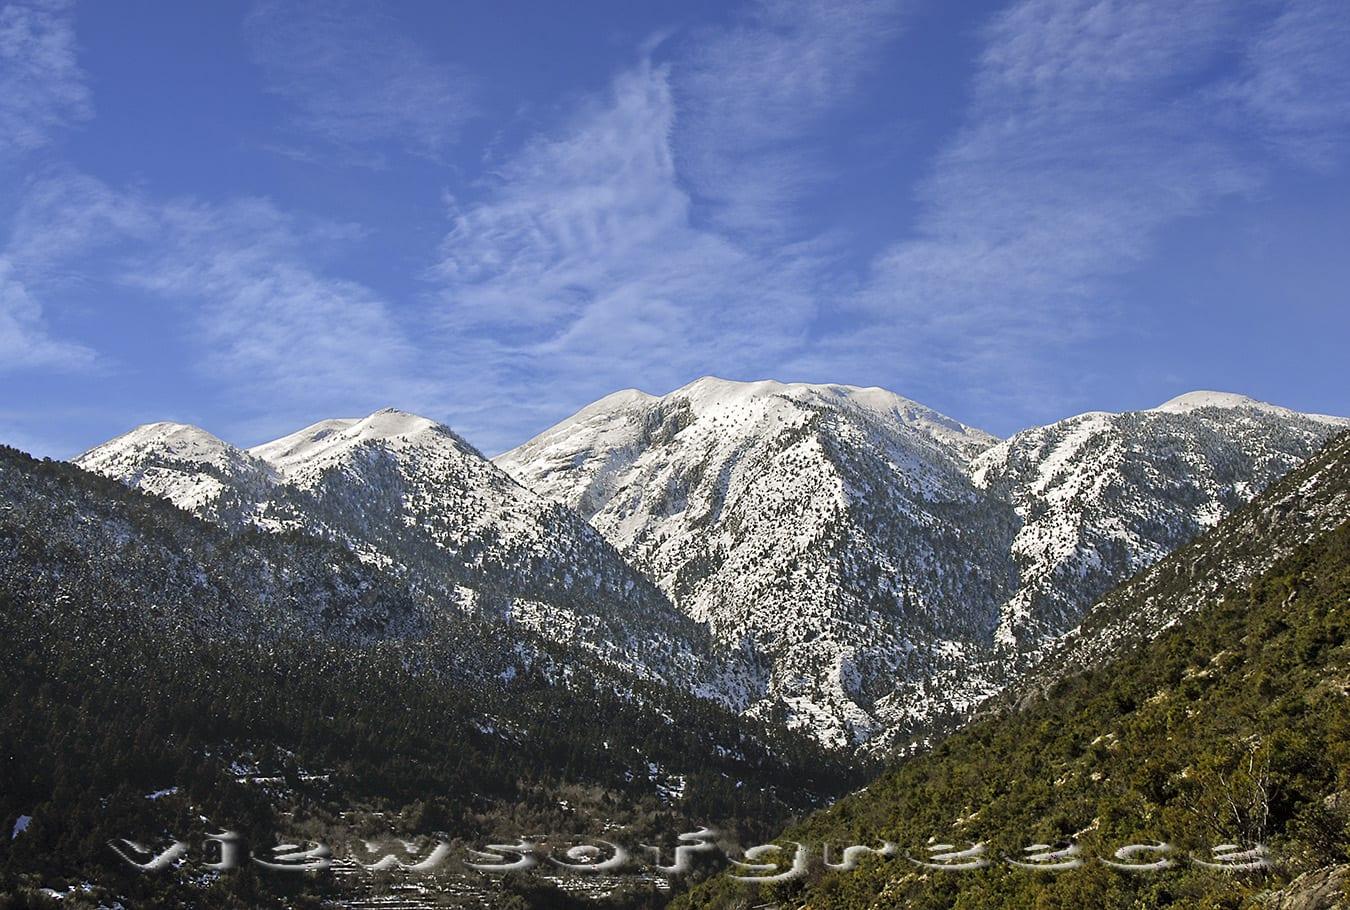 parnonas, peloponnese, mountain, greece, parnon, historical, arcadia. Πελοπόννησος, ορεινή Αρκαδία, Καστάνιτσα, Πραστός, χωριά, Πάρνωνας, δάσος, χιόνι, φθινόπωρο